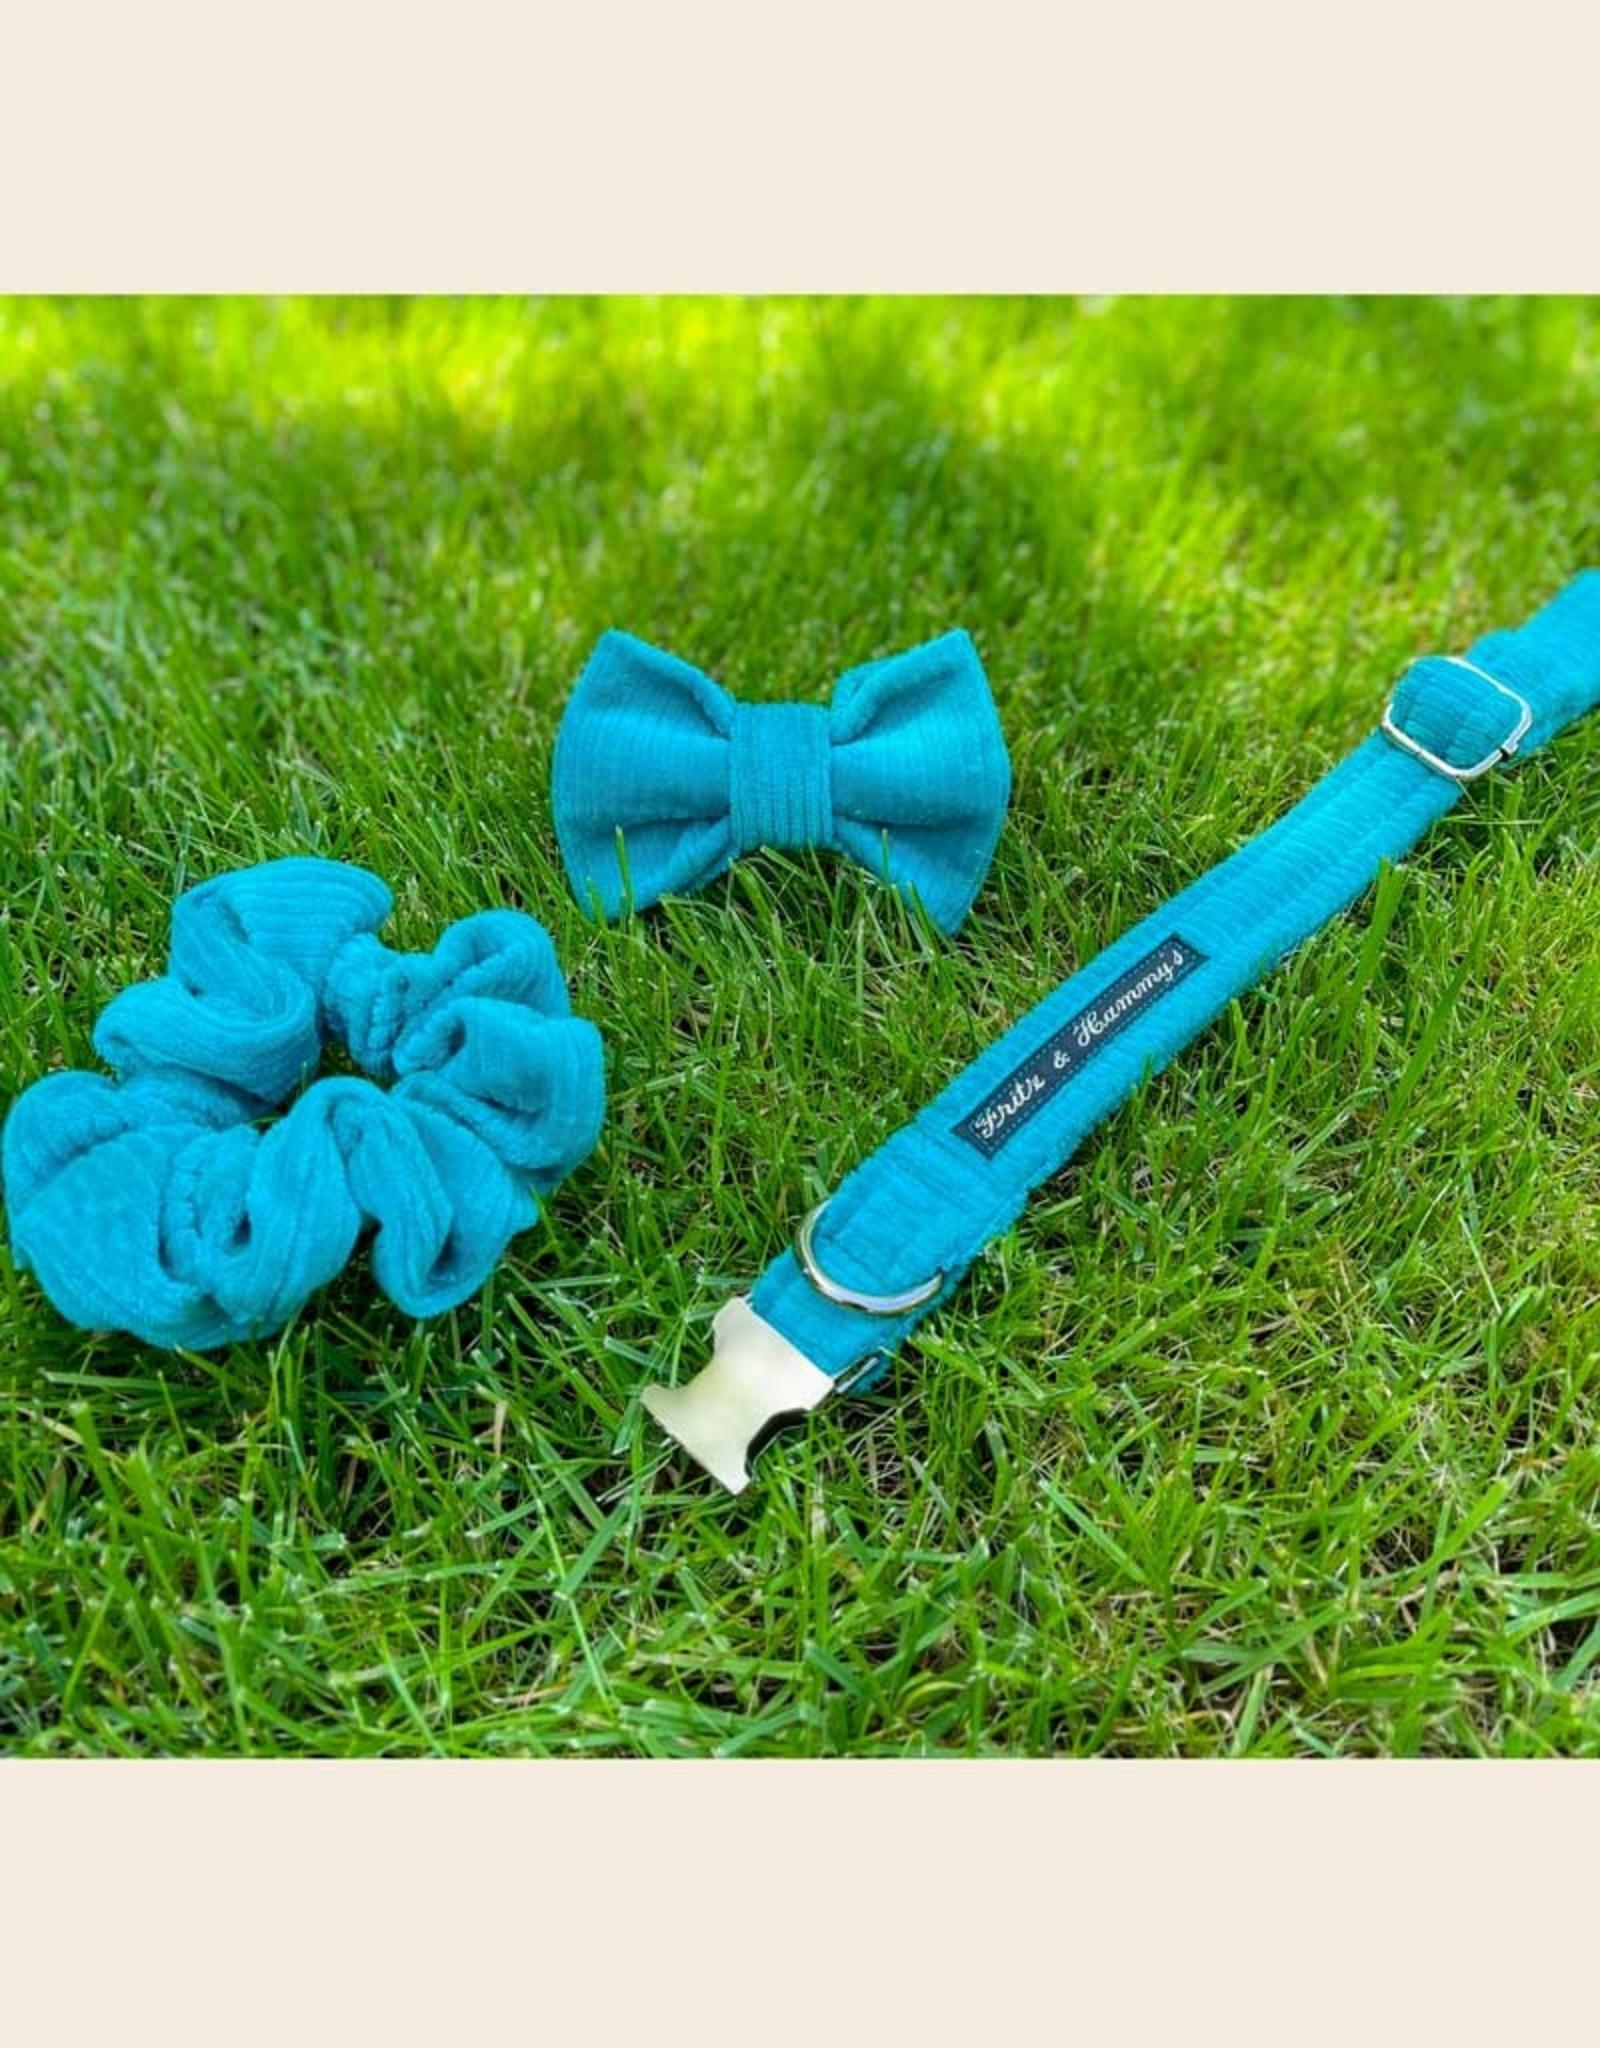 Halsband | Mojito | Biologische Cord Nicky Stof